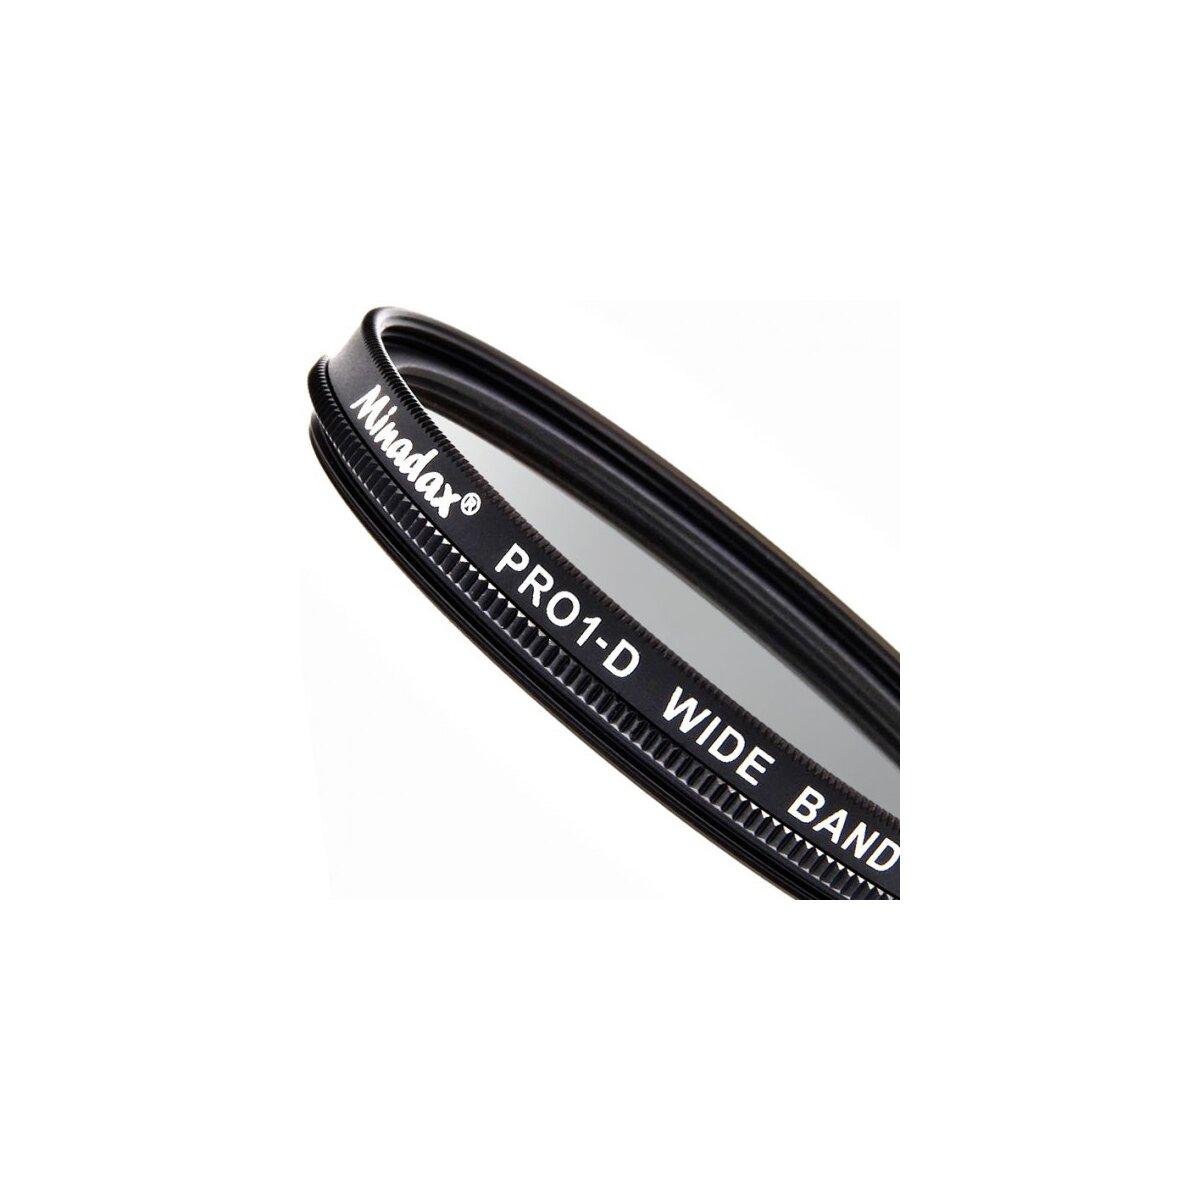 CPOL-Filter 67mm PRO-1D Slimline, ultraduenn Zirkular Polfilter - mehrfachverguetet